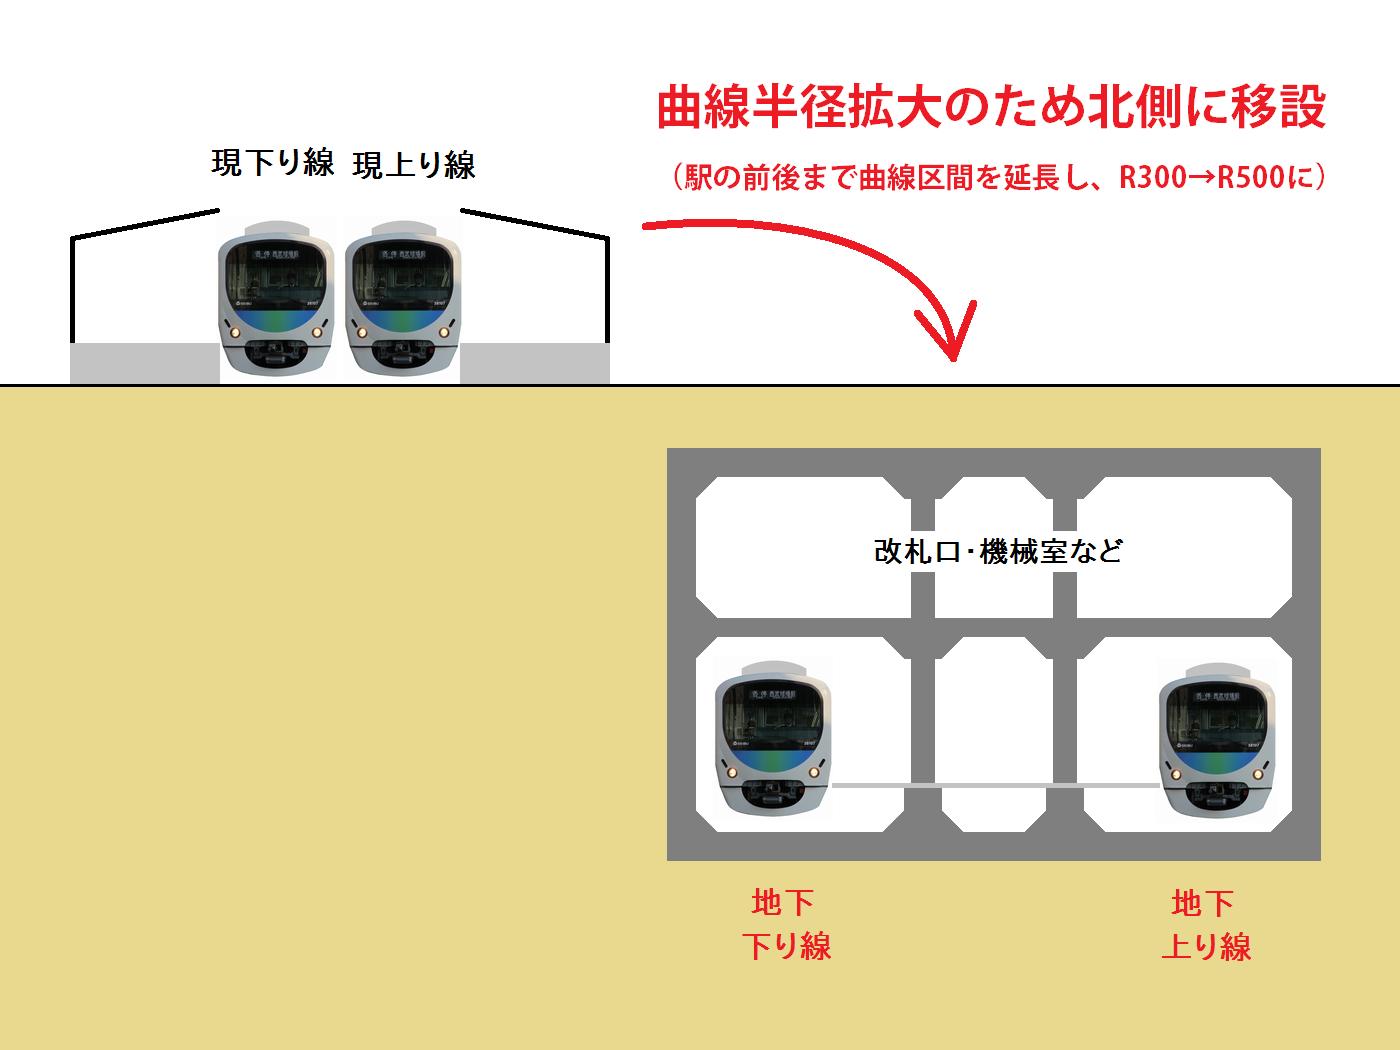 新井薬師前駅の地下化後の断面図